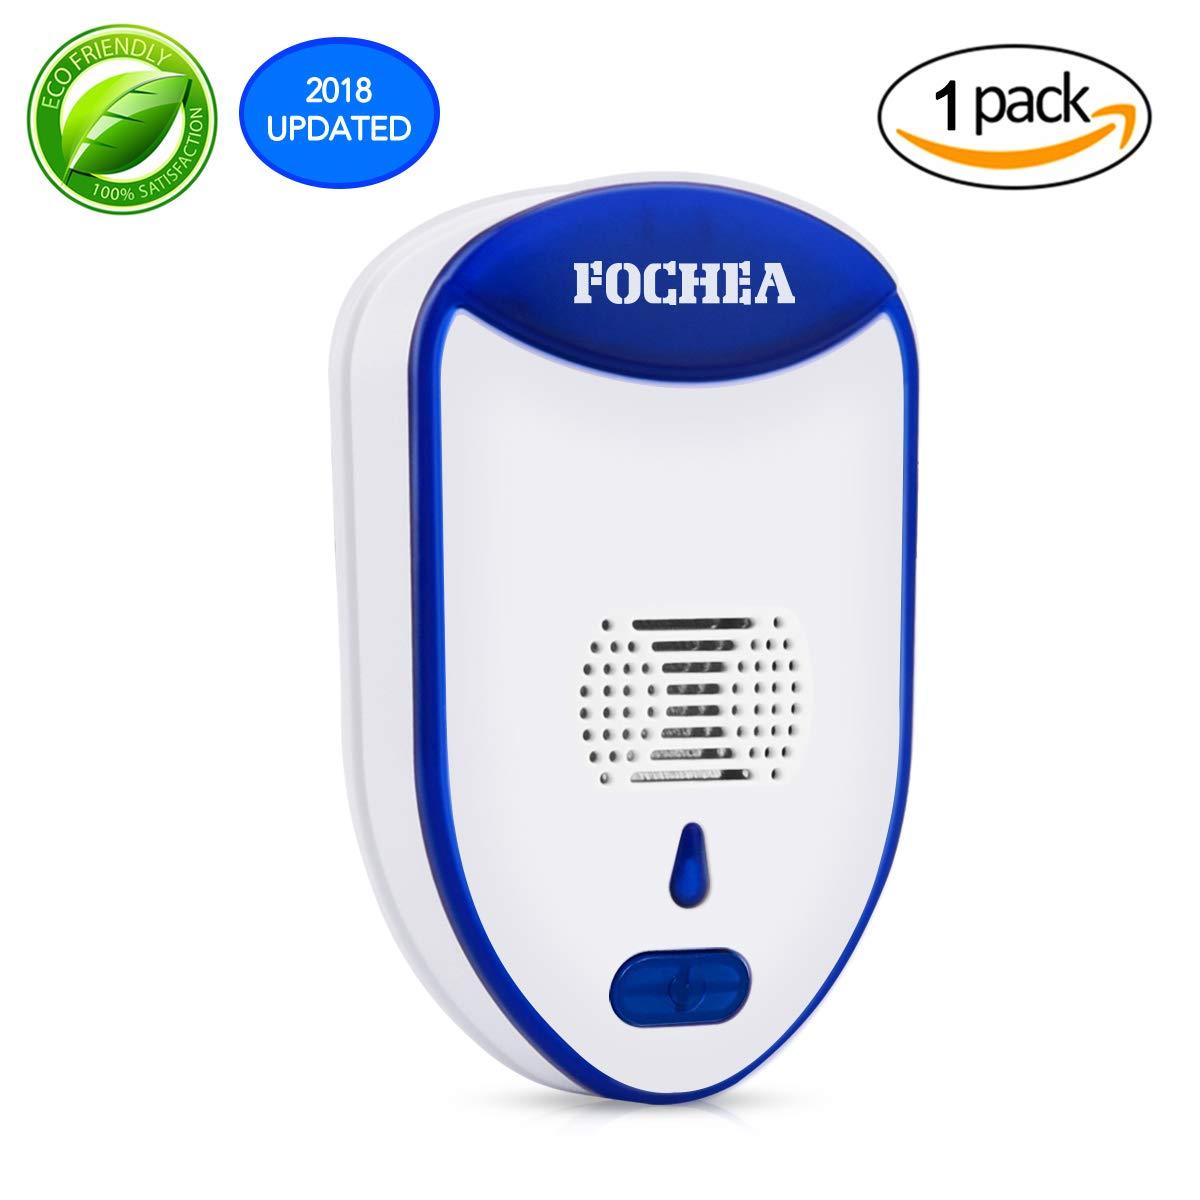 Fochea Repelente Ultrasónico de Plagas Repelente Insectos Electrónico Enchufable, Control de Plagas para Interiores para